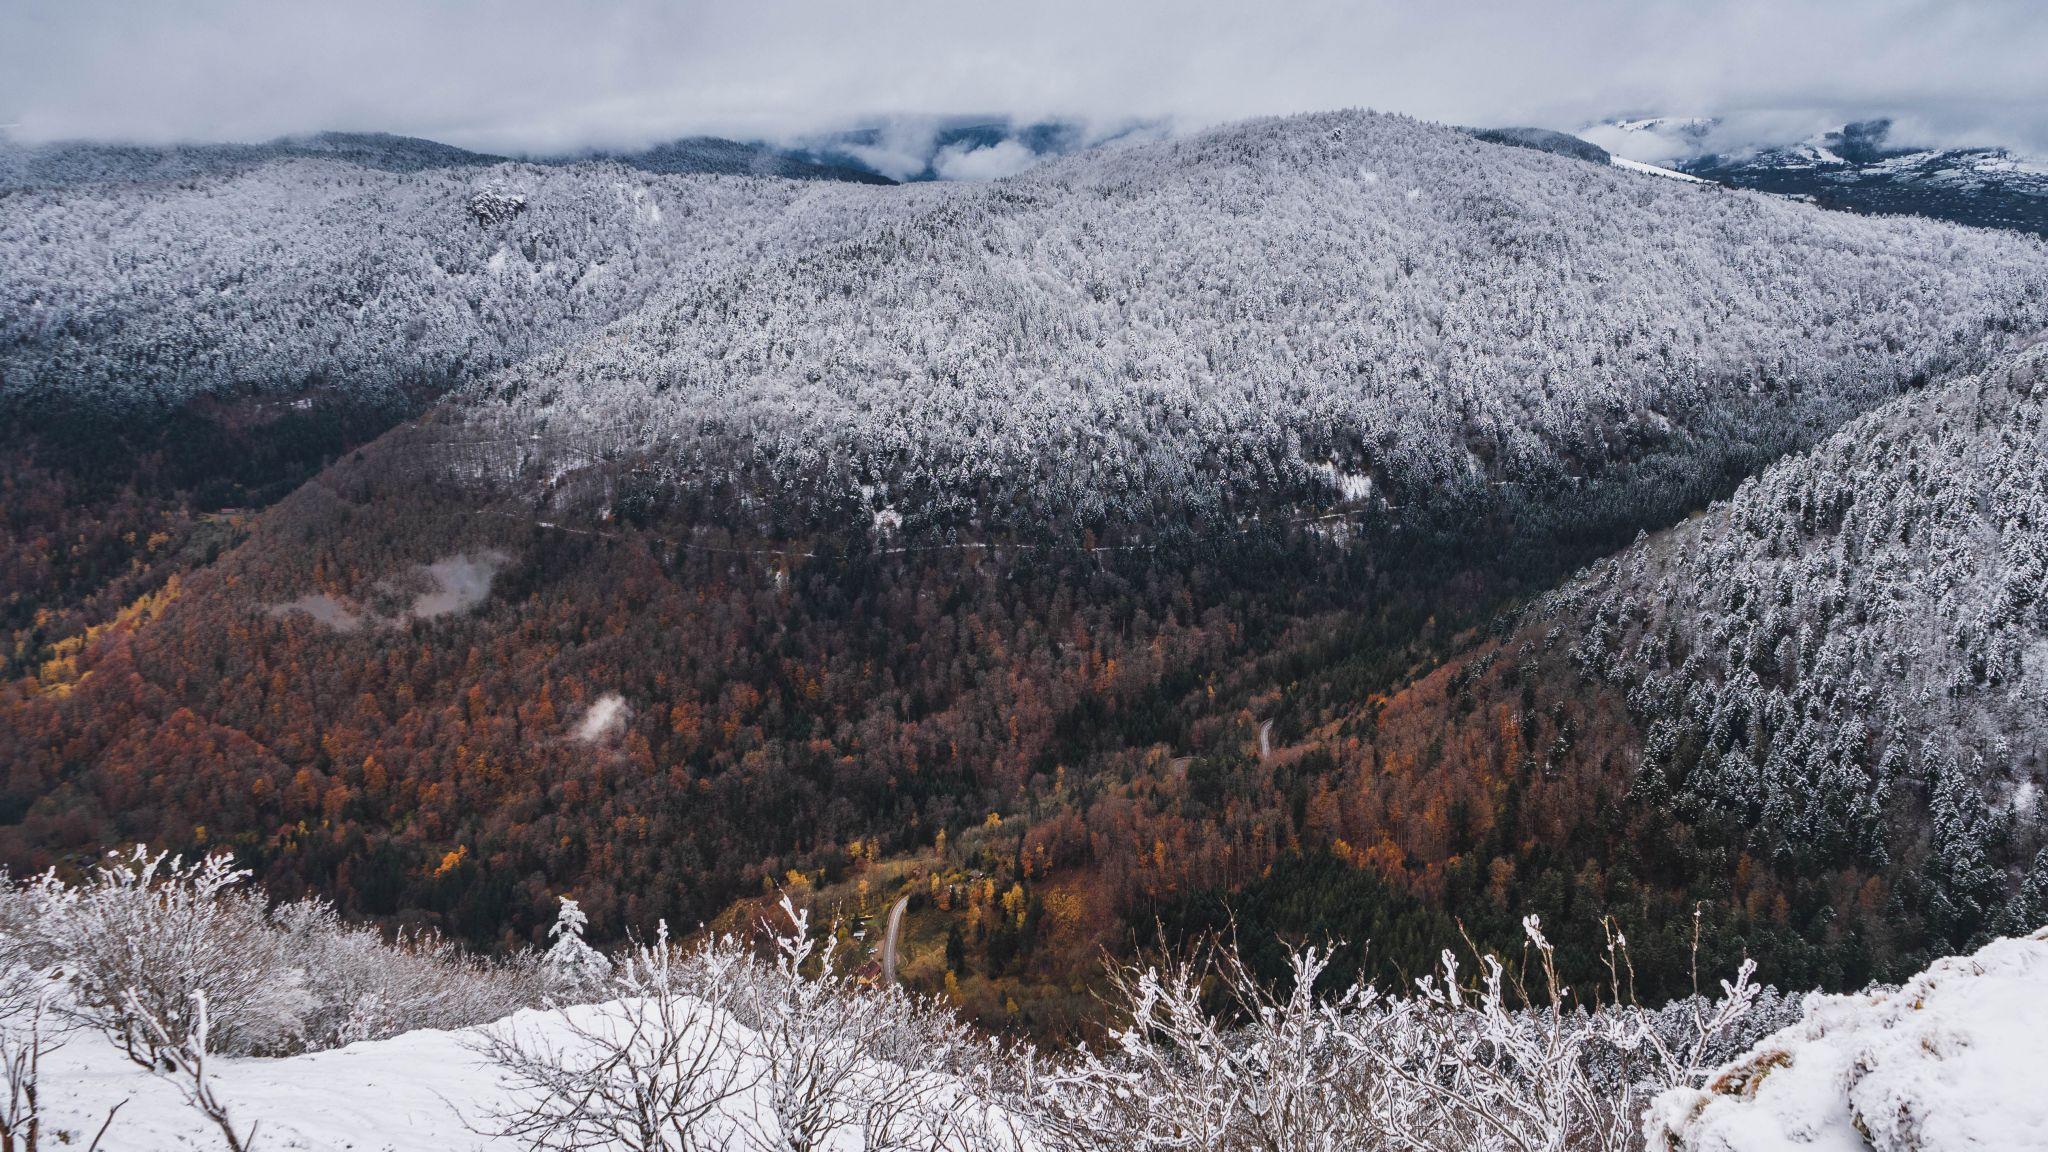 Two seasons, France